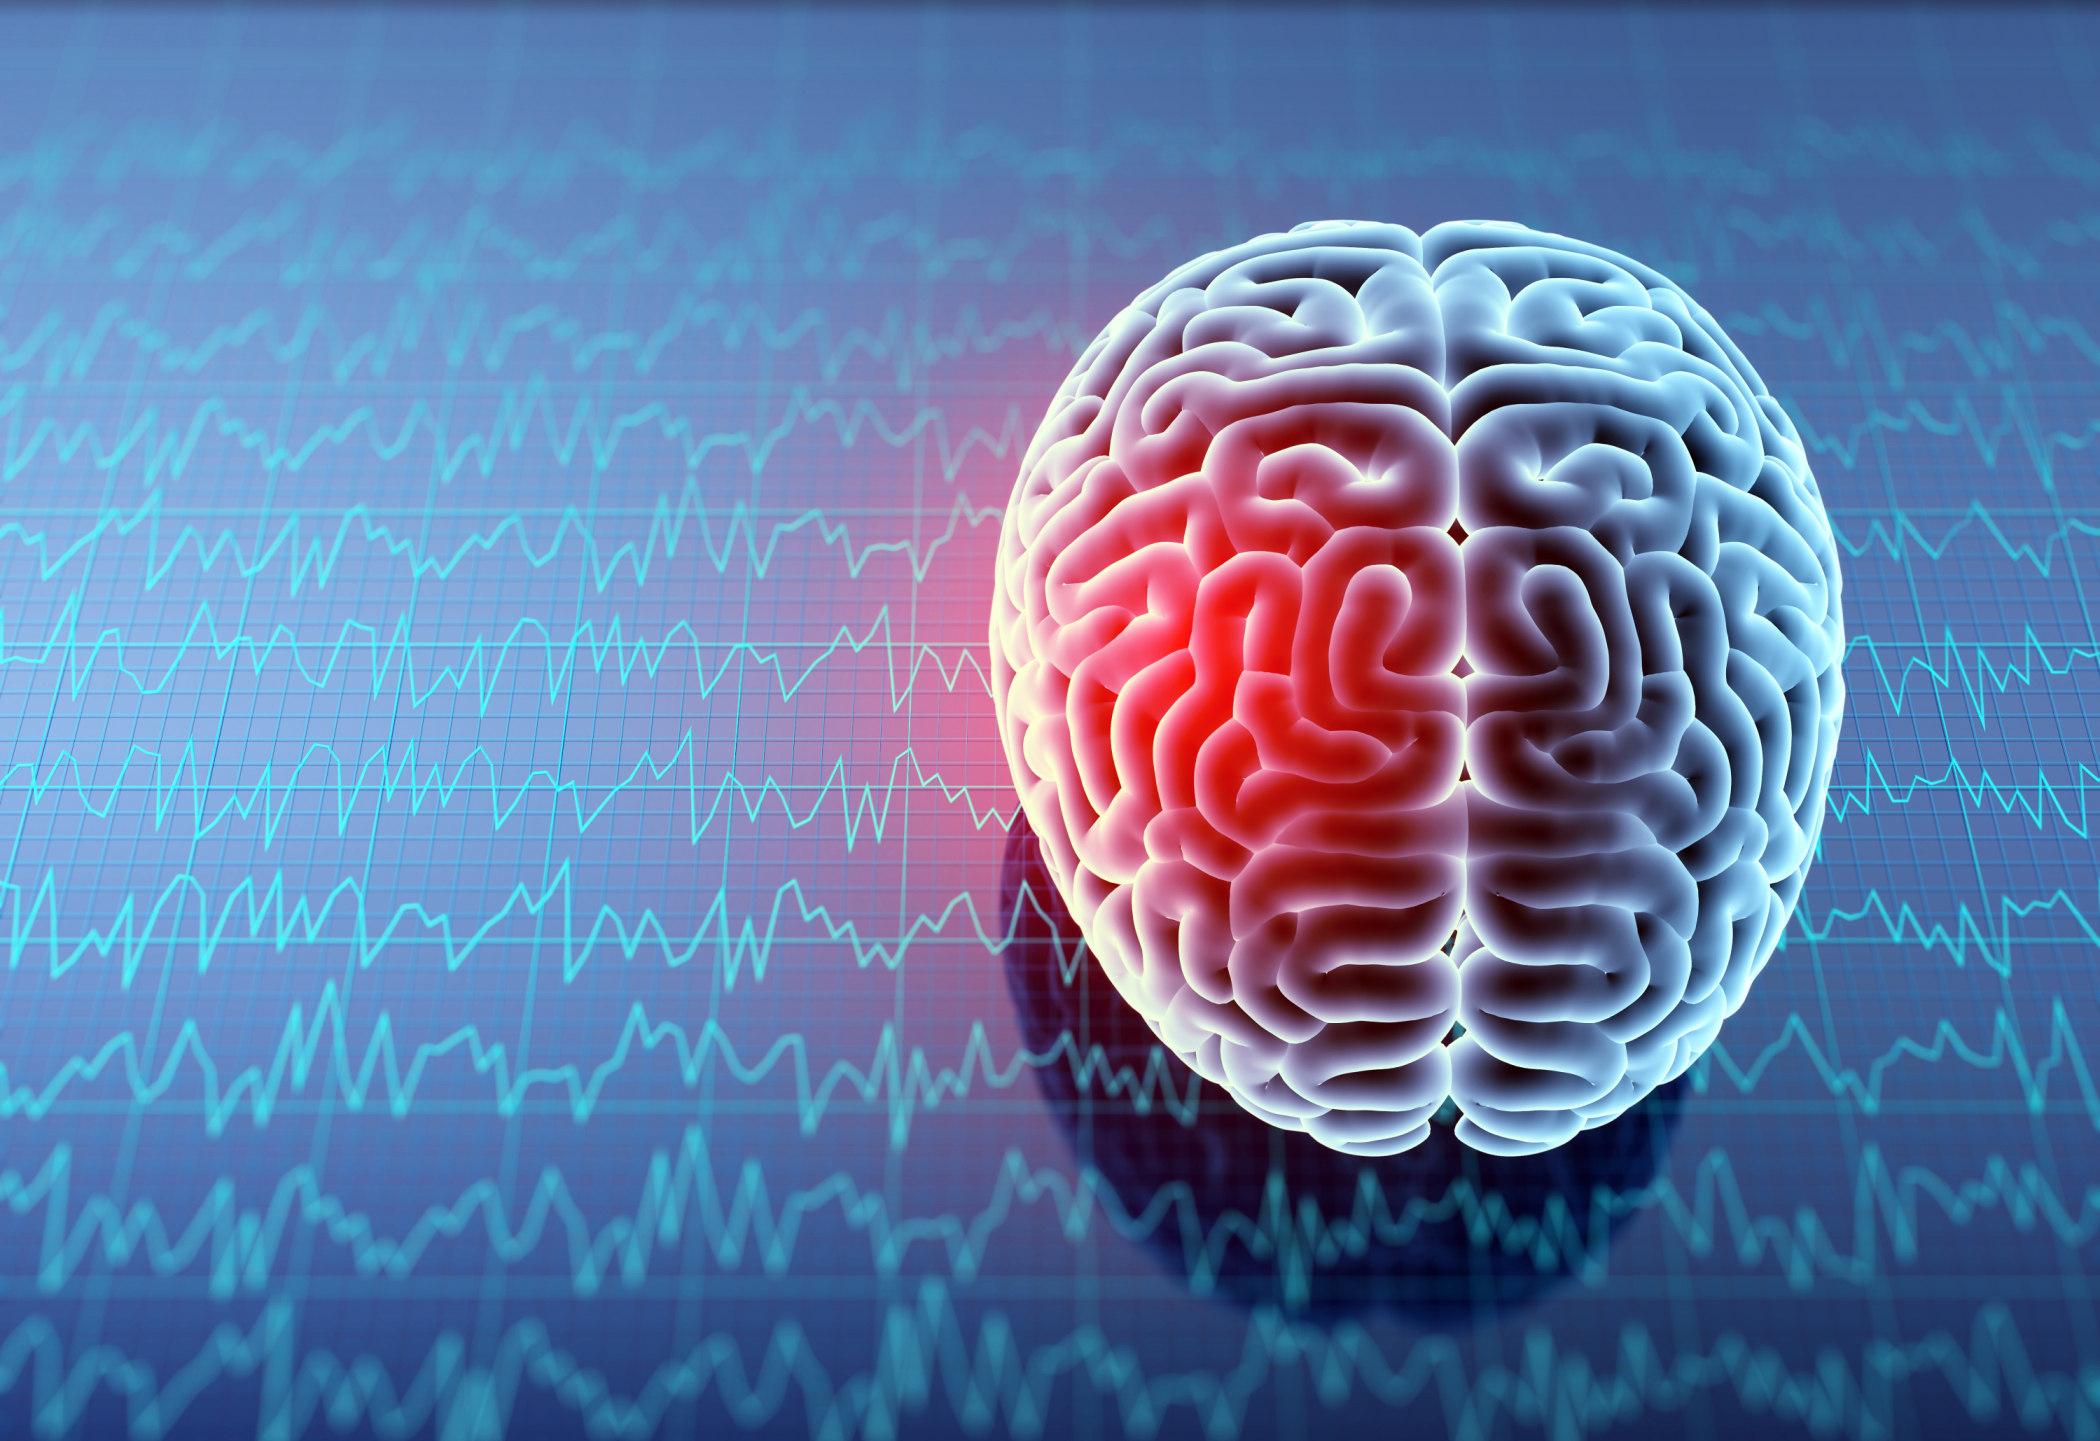 A brain injury